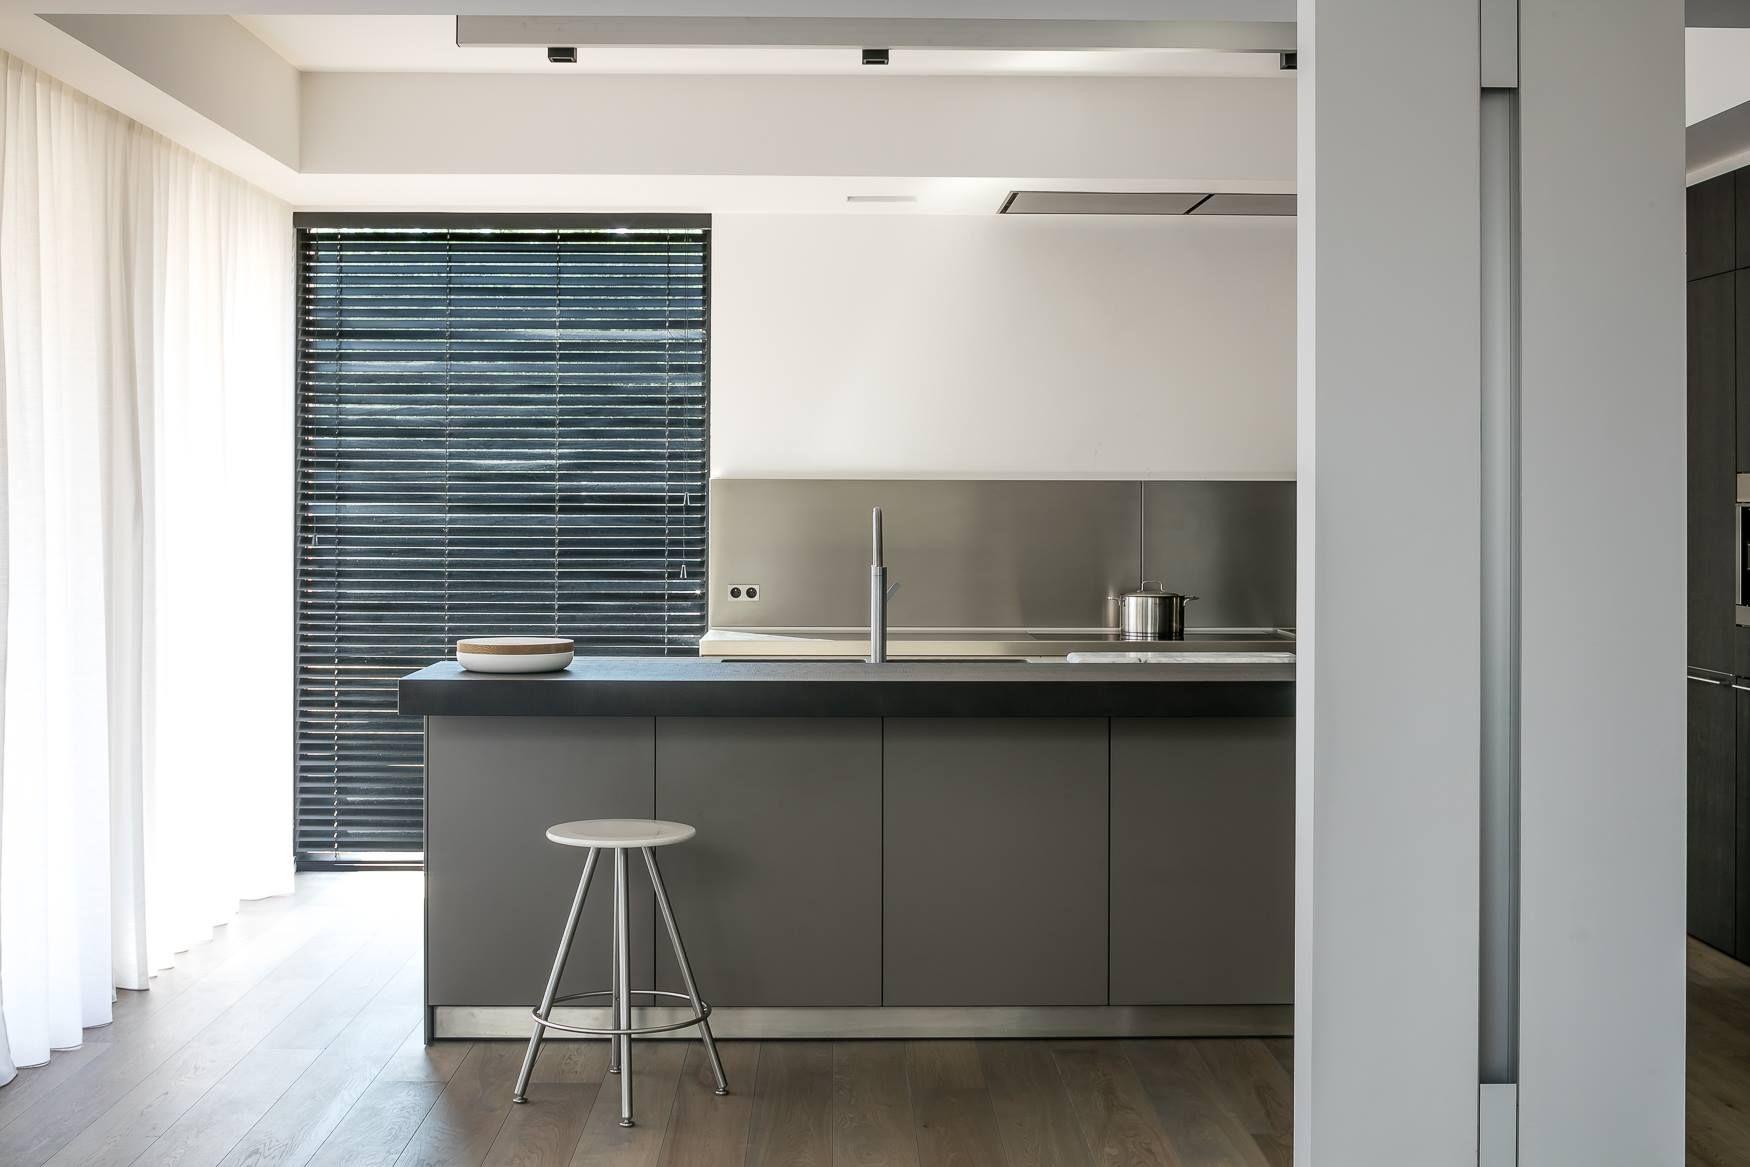 Bulthaup B3 Keuken : Bulthaup b kleine küche schon hochschrank kuche entwurf ideen